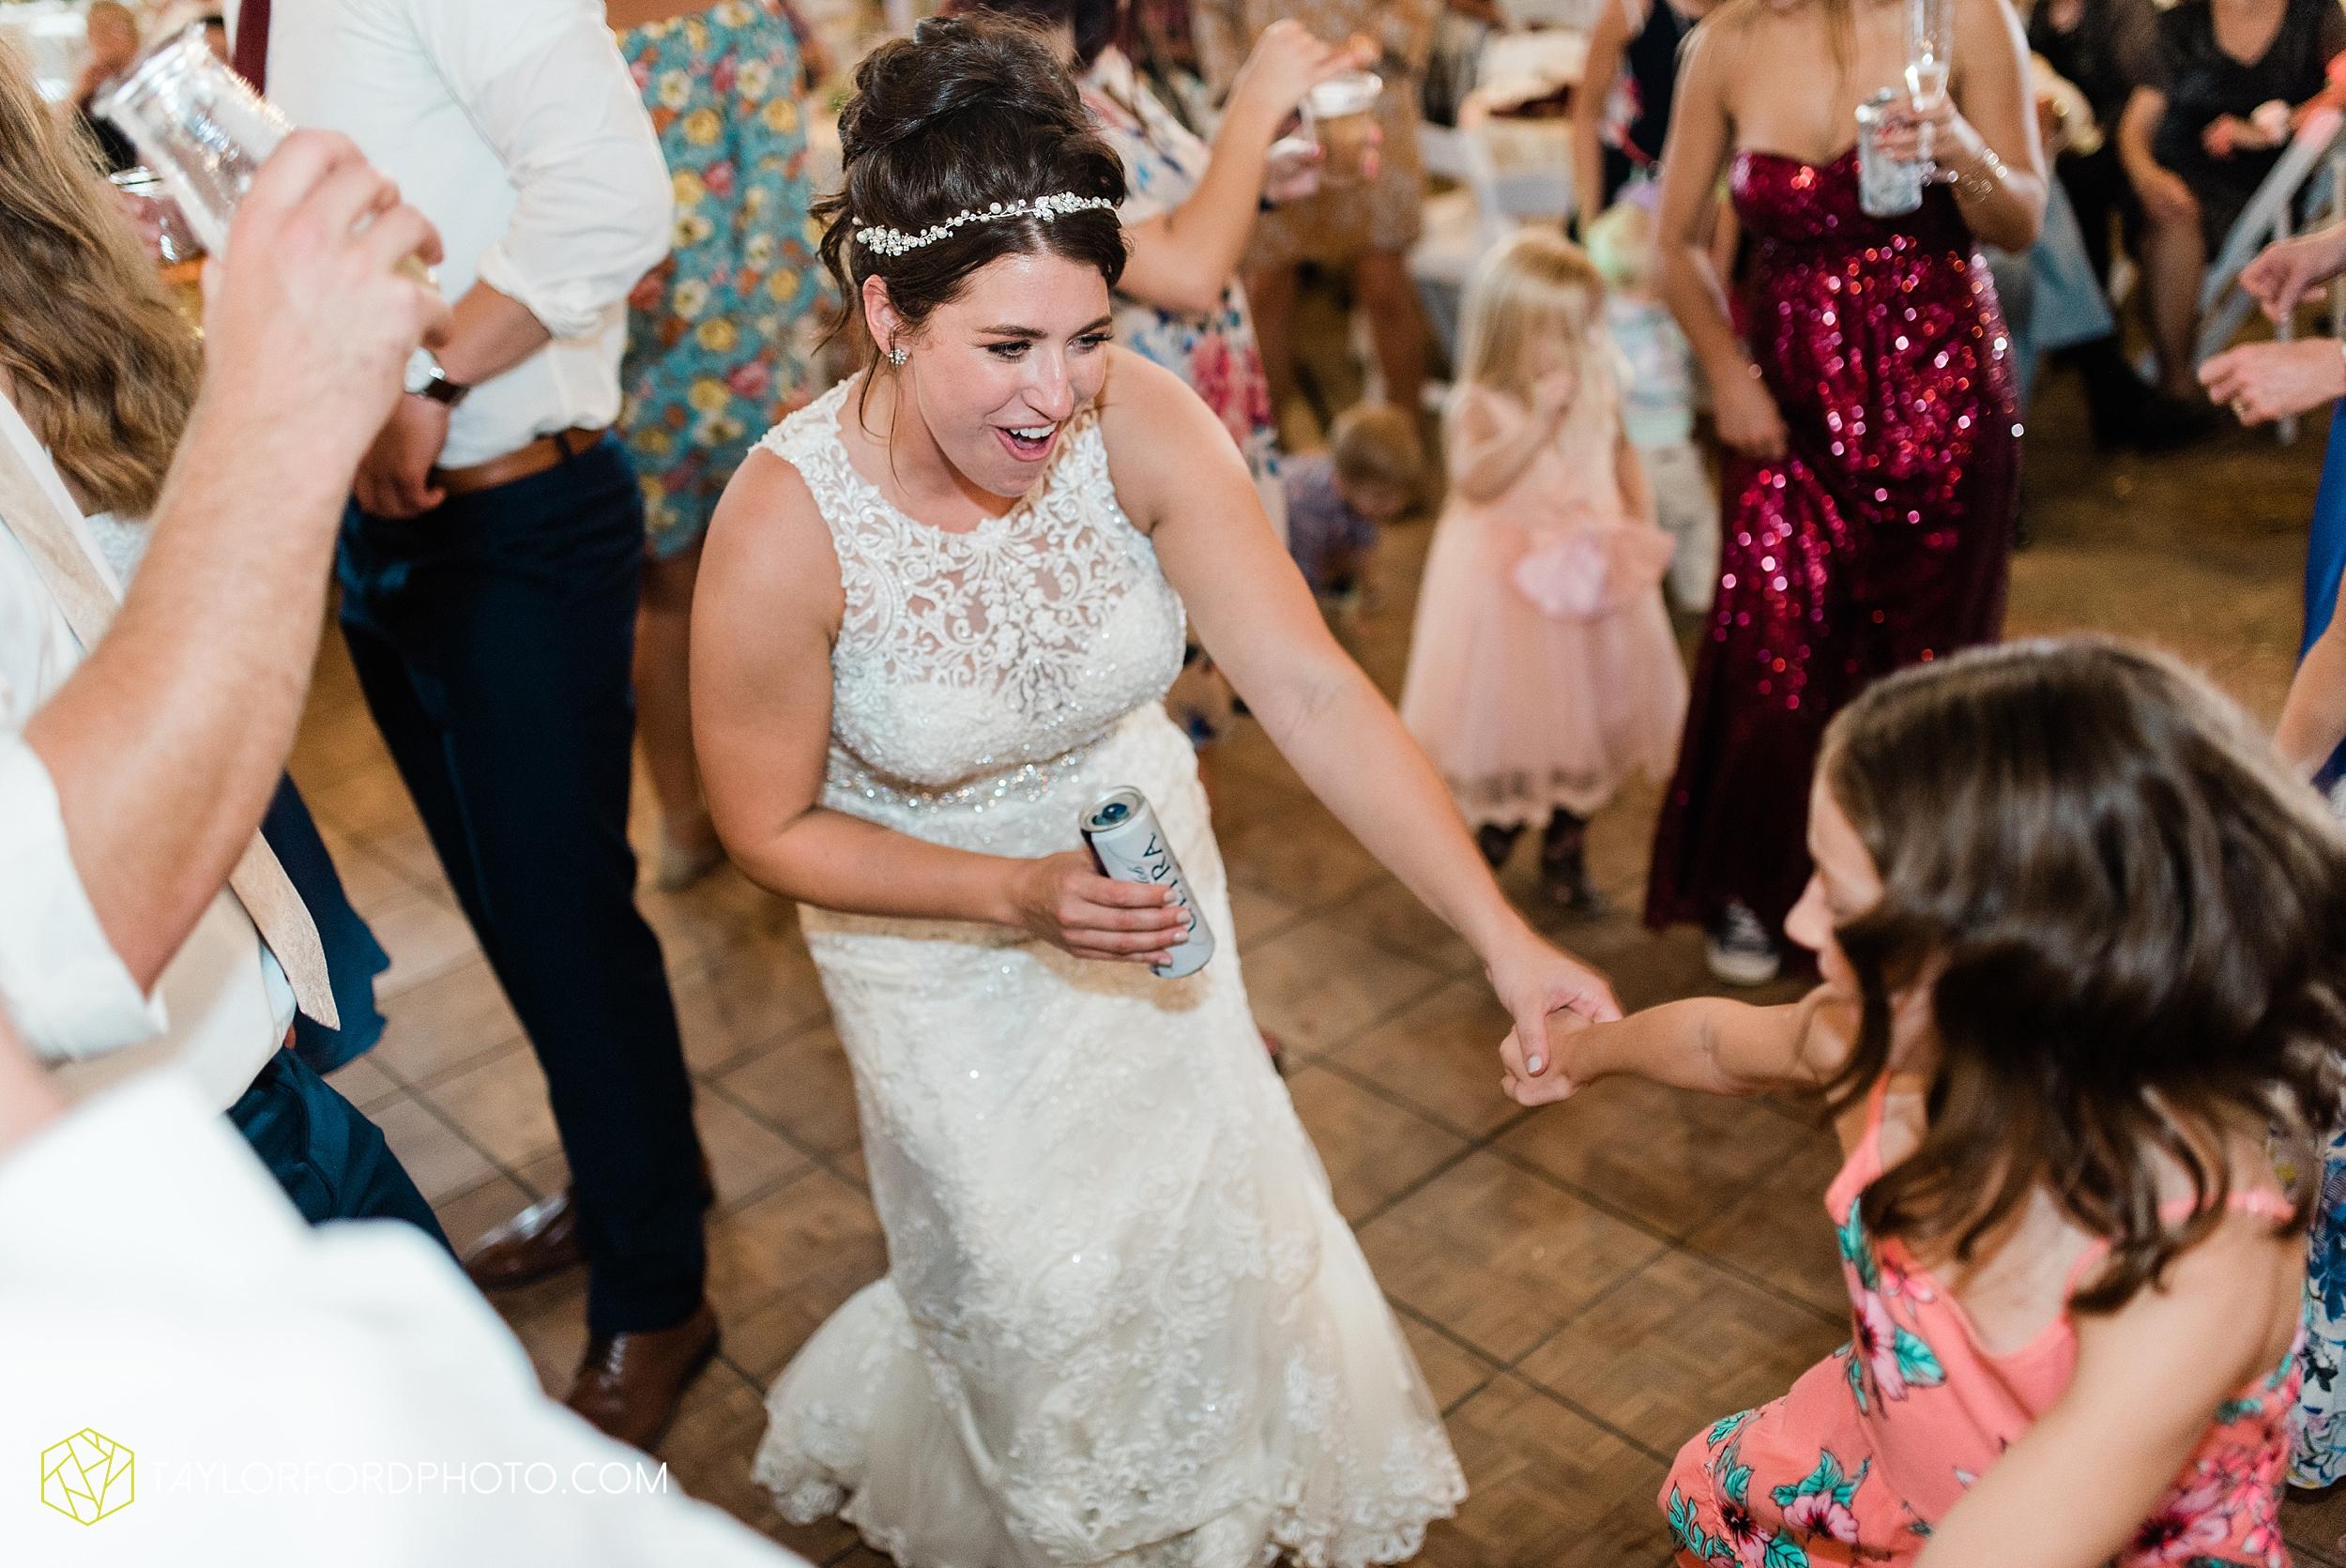 van-wert-ohio-first-united-methodist-church-county-dairy-barn-wedding-photographer-taylor-ford-photography_9876.jpg